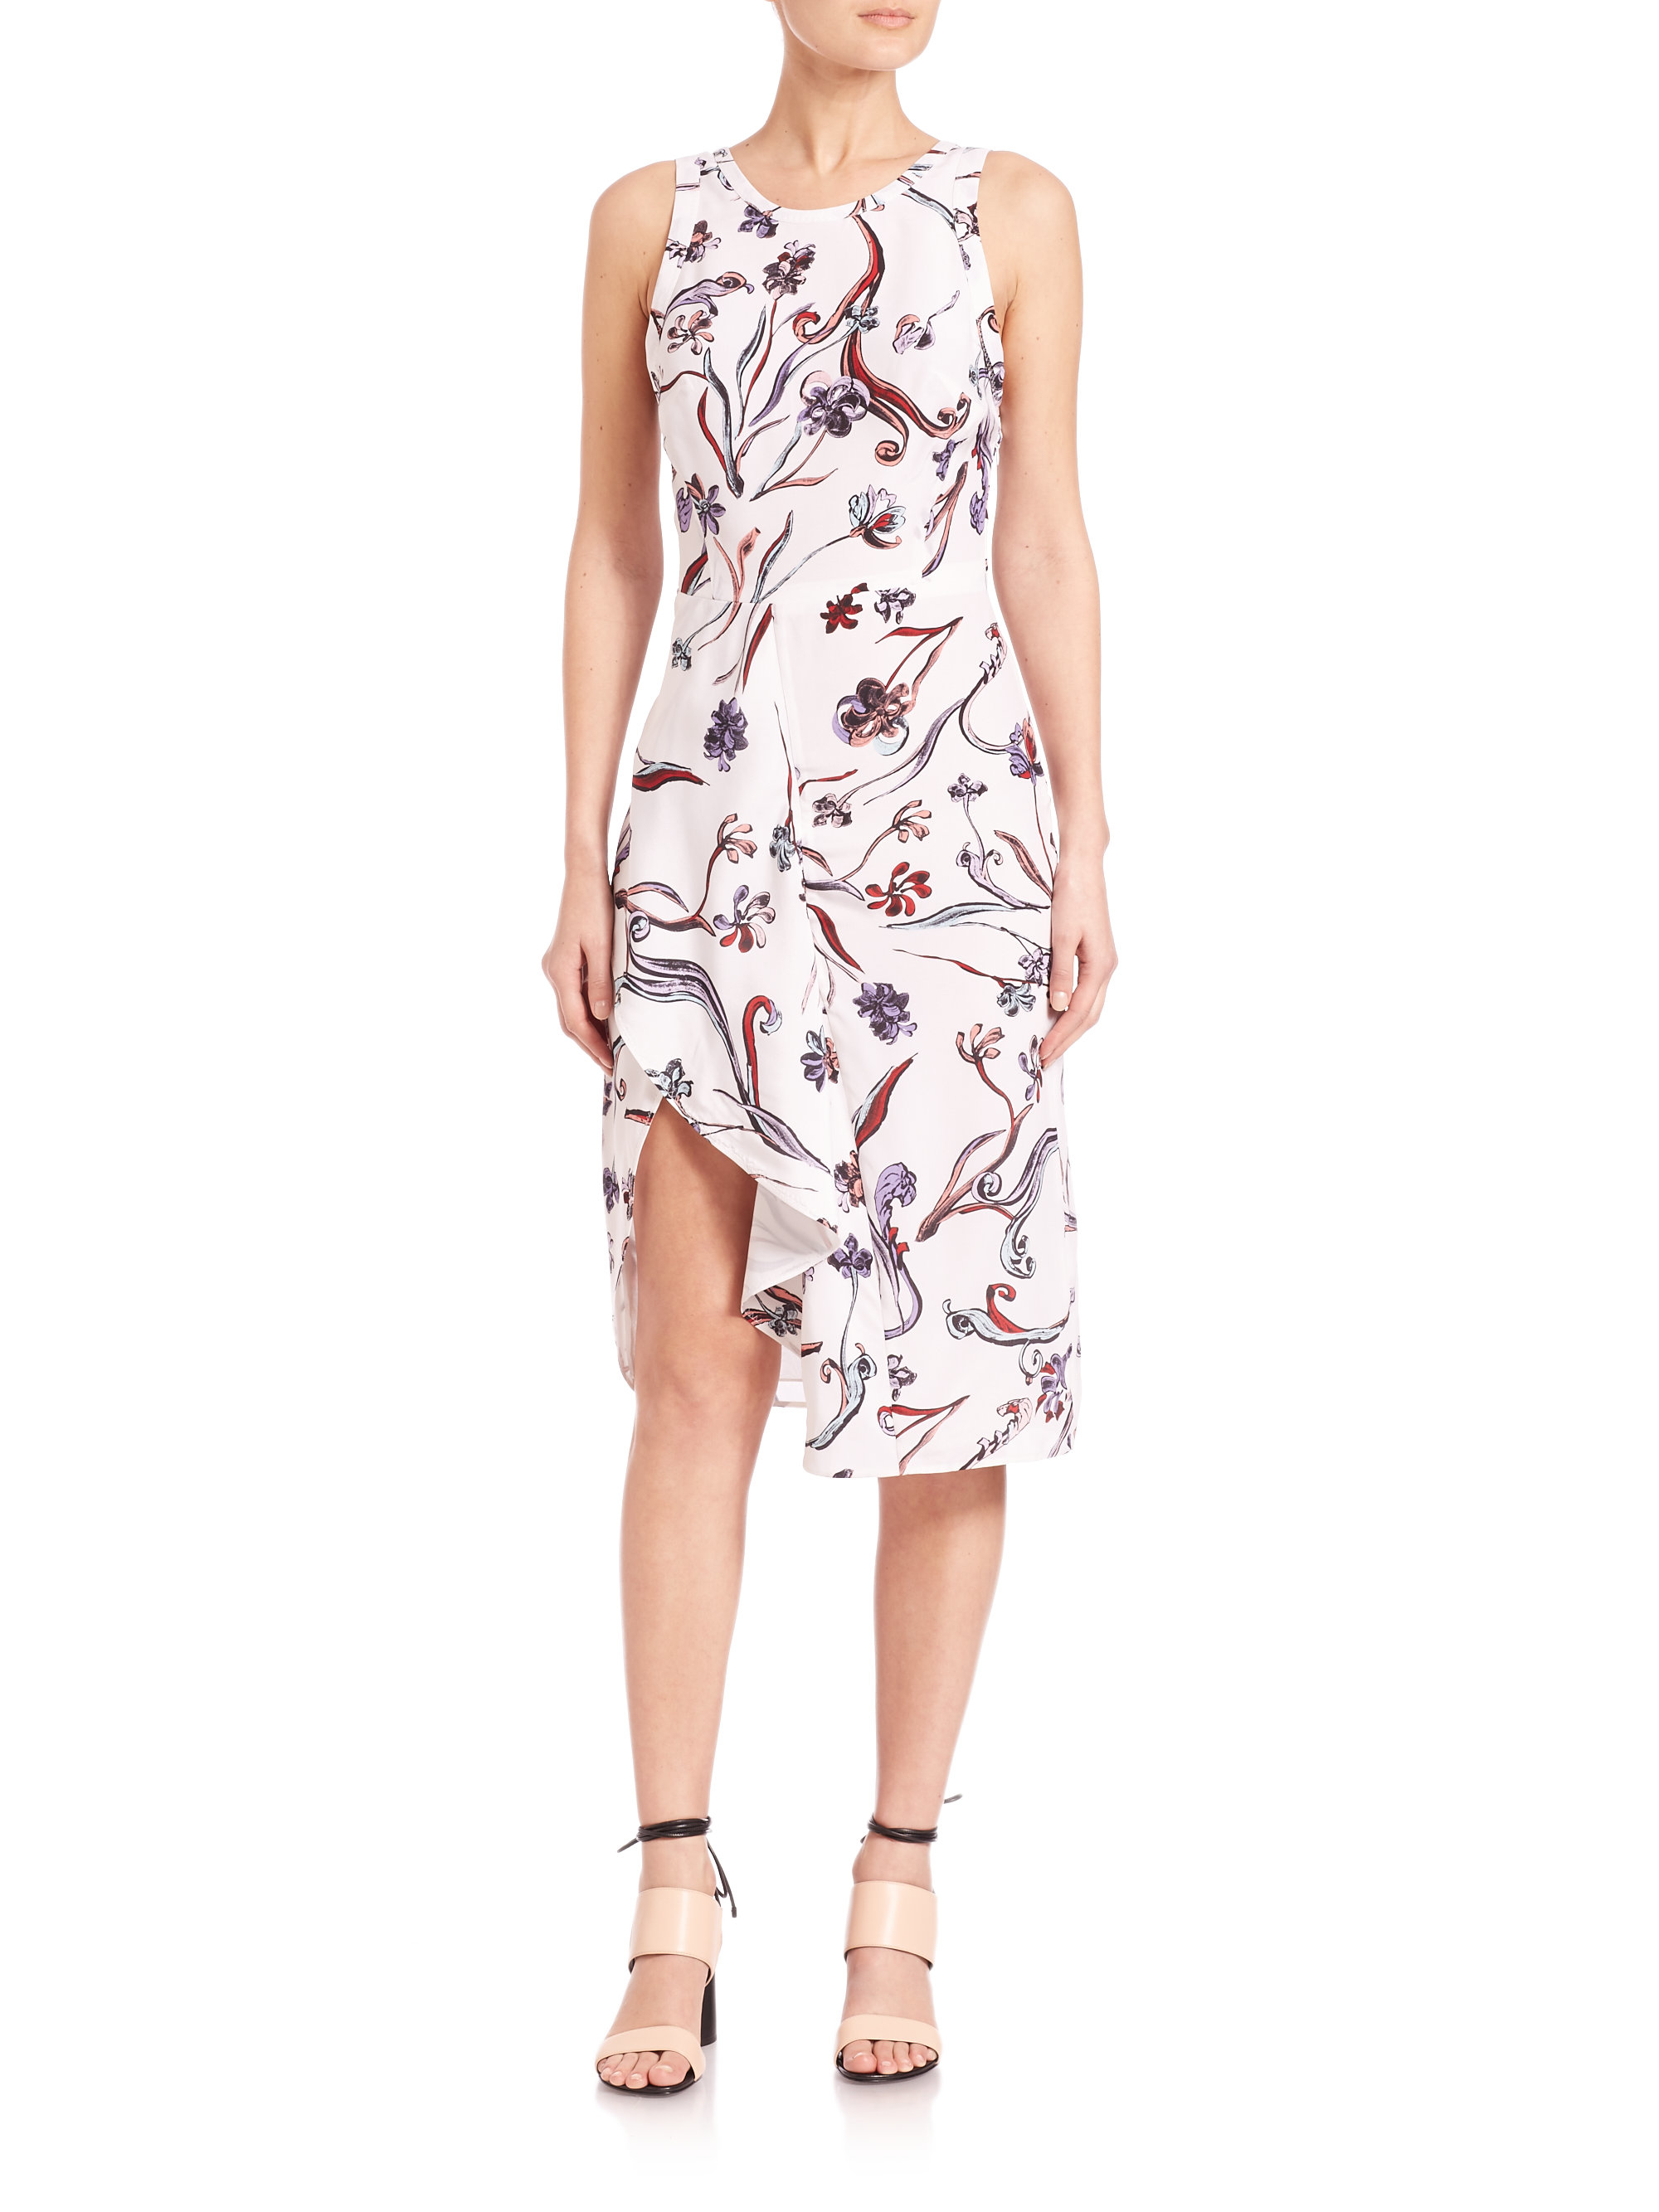 3.1 Phillip Lim Woman Embellished Floral-print Paneled Silk-twill Dress White Size 4 3.1 Phillip Lim Particular rlxW3TjKs